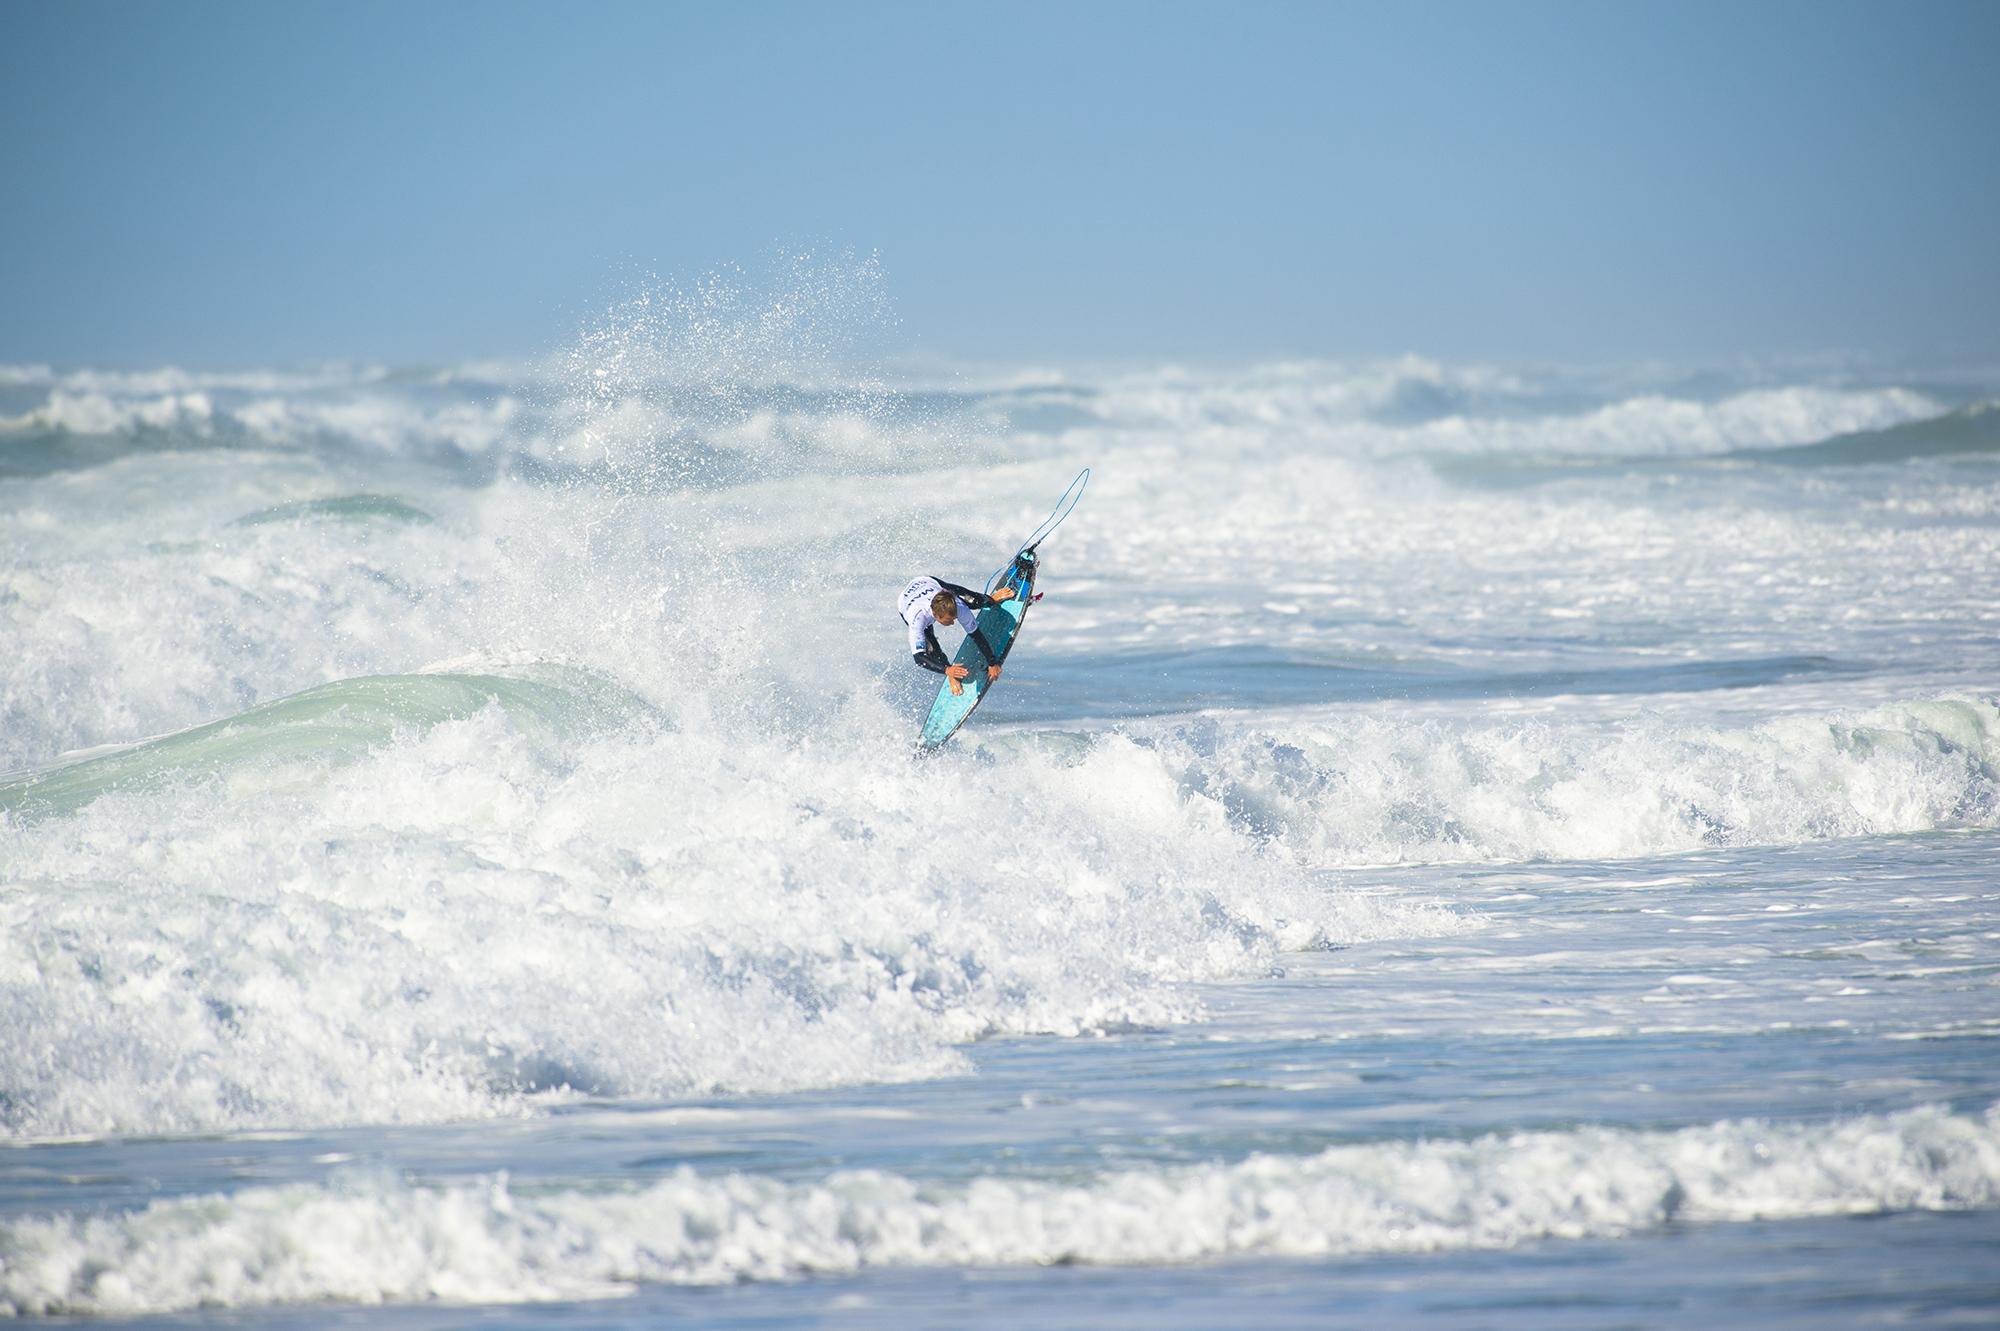 erwan-blouin-french-surfing-championships-2017-hossegor-we-creative-antoine-justes